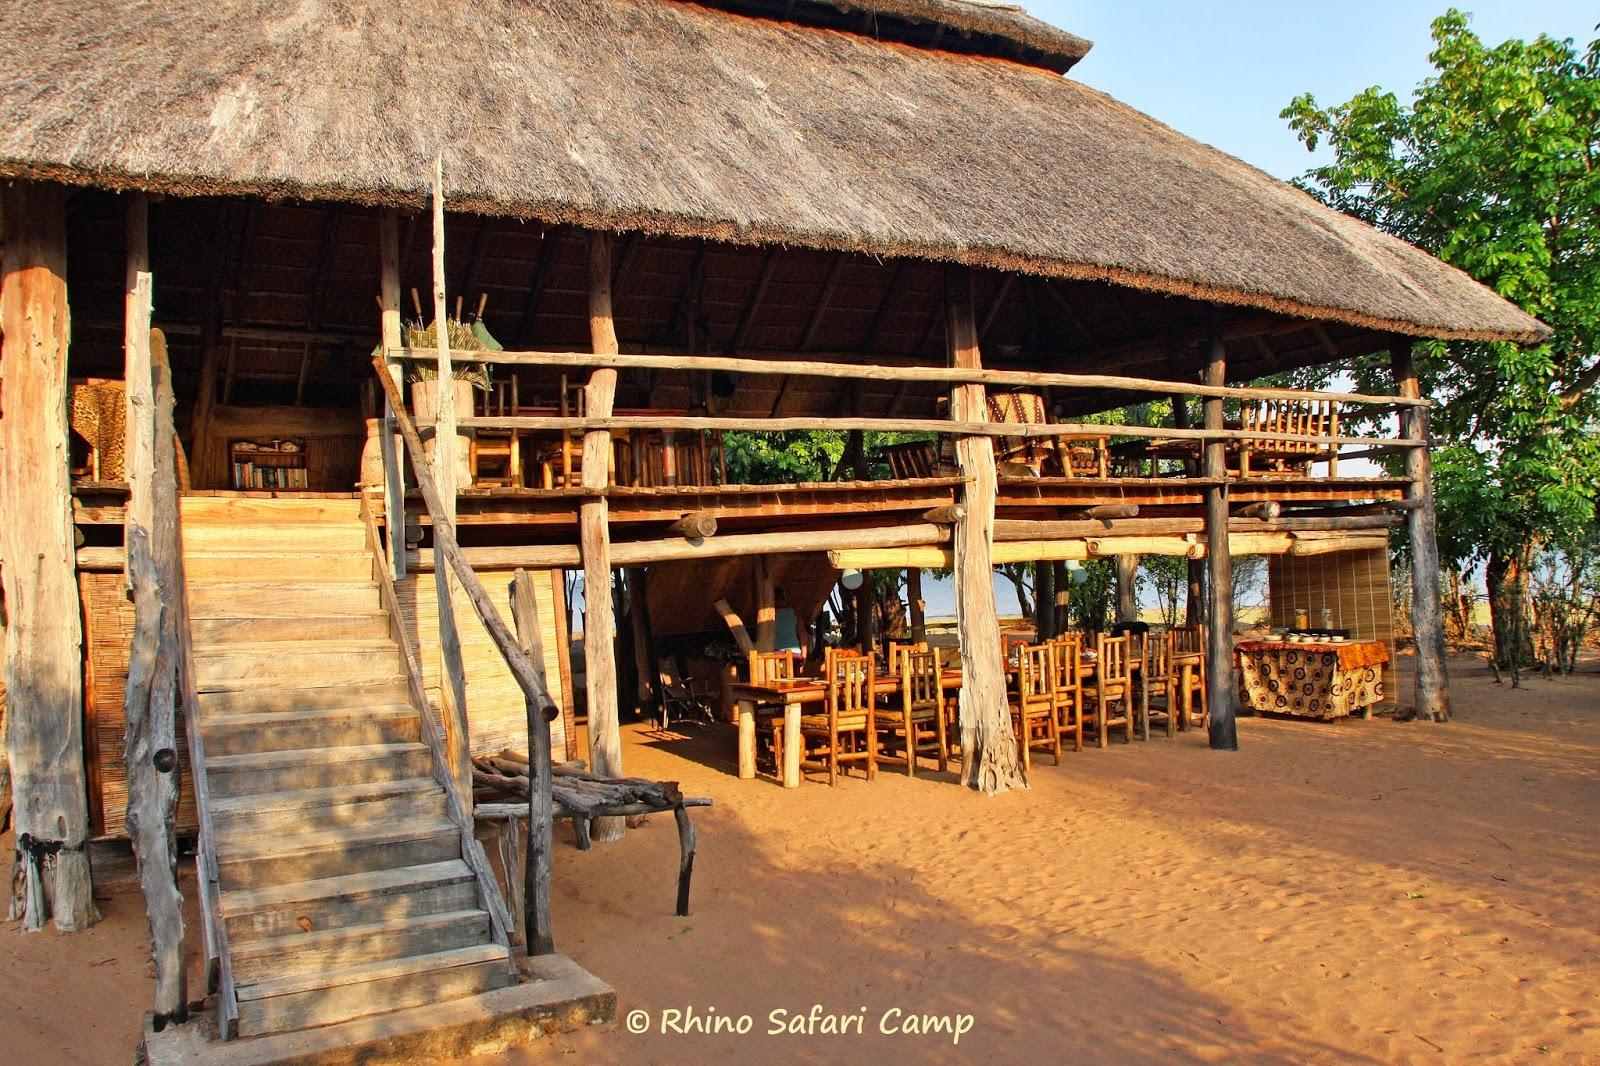 The main lounge and dining area - Rhino Safari Camp